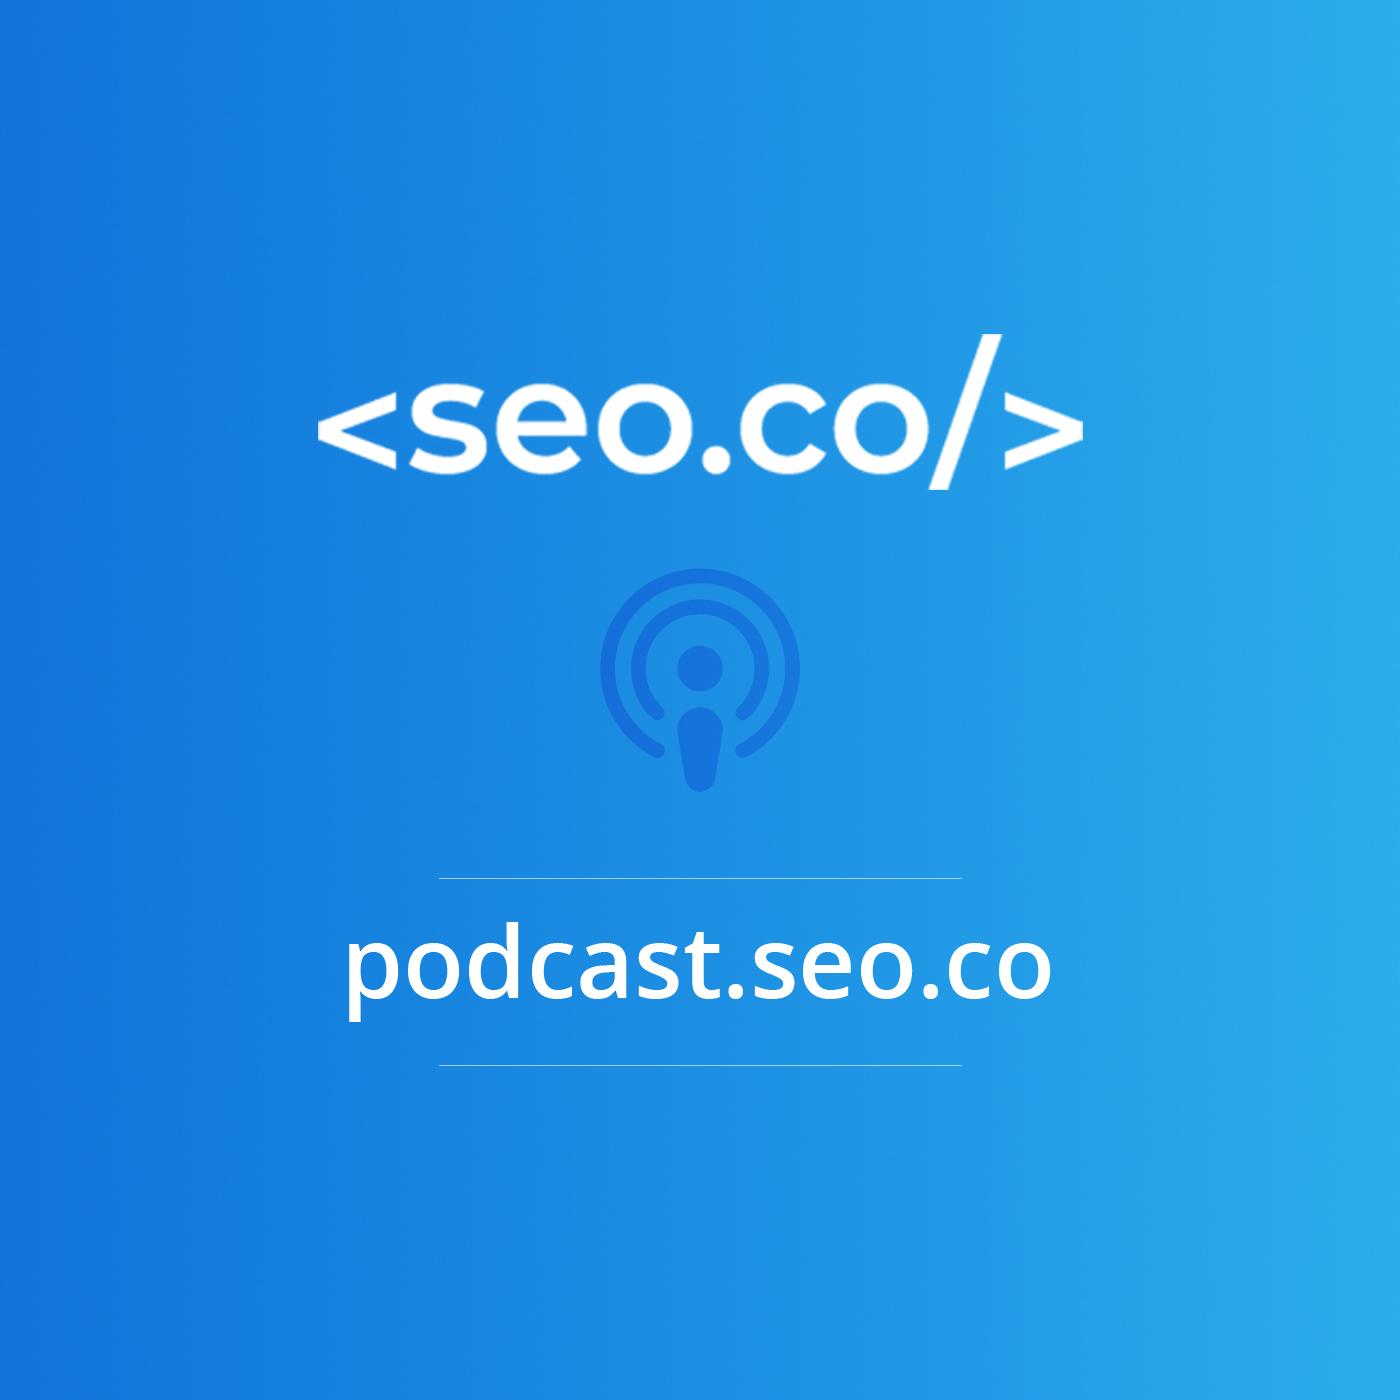 SEO Podcast | SEO.co Search Engine Optimization Podcast show art